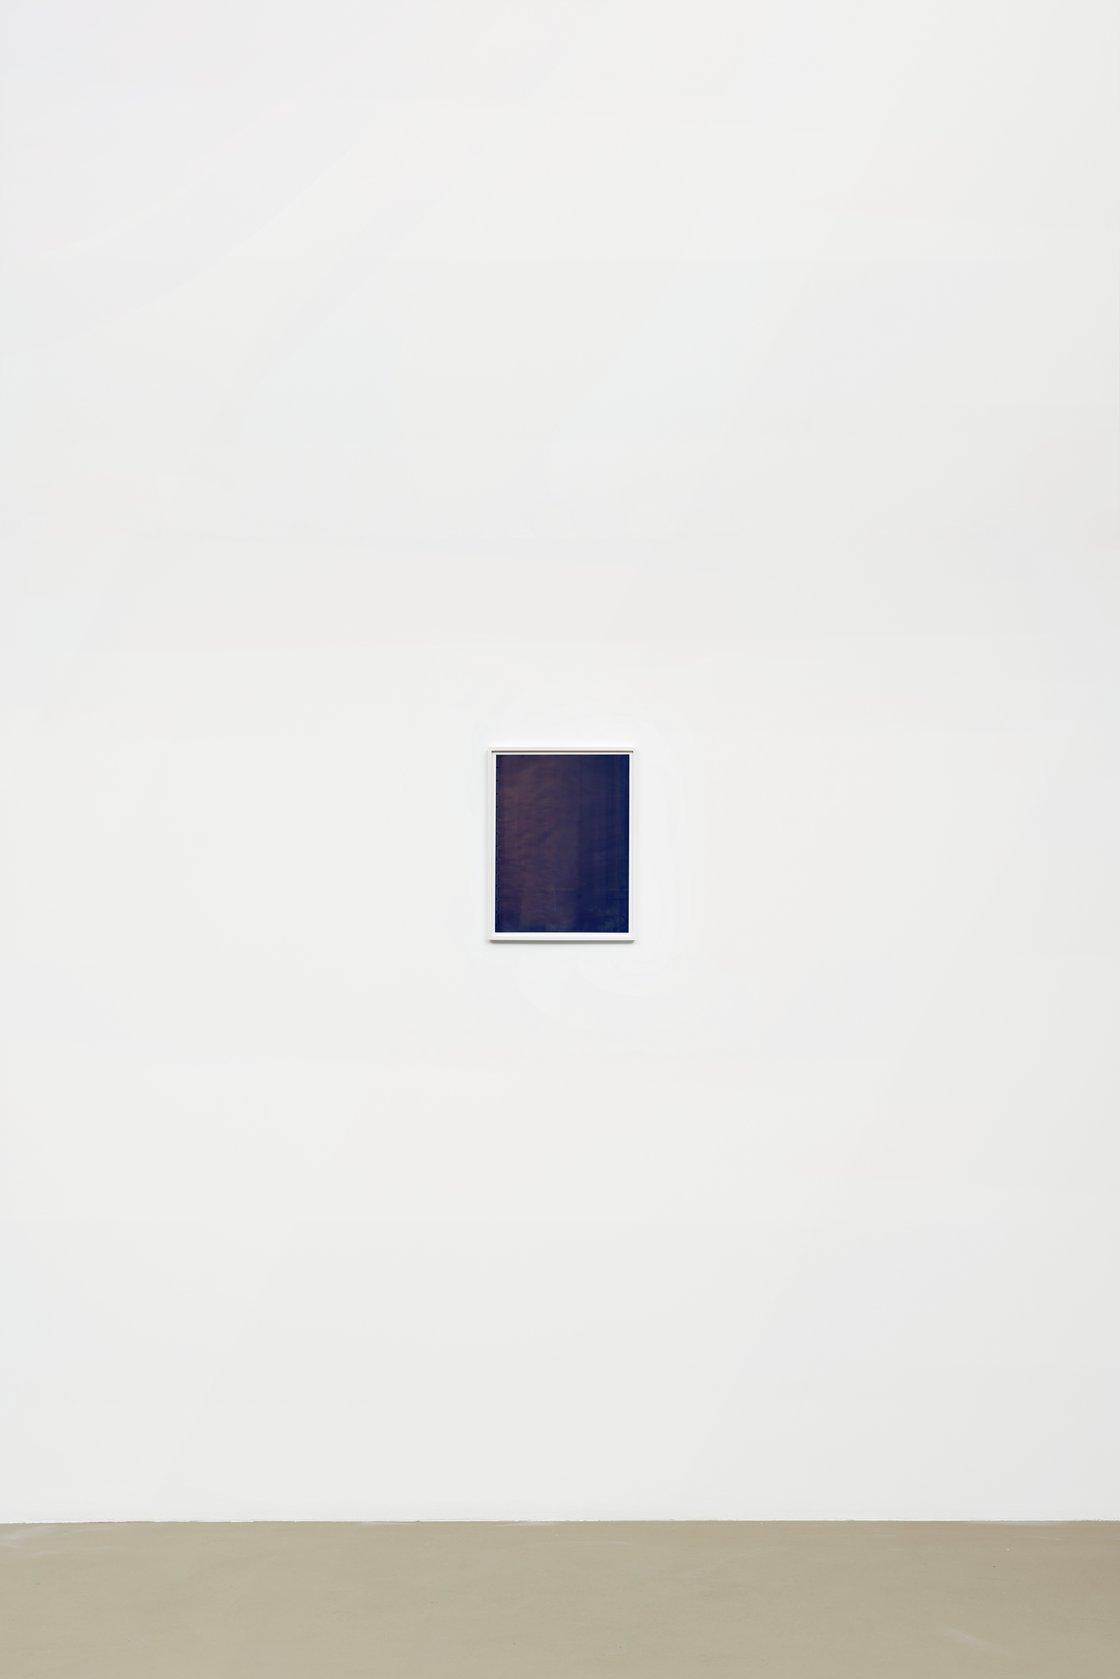 Wolfgang Tillmans, Silver 240, 2014